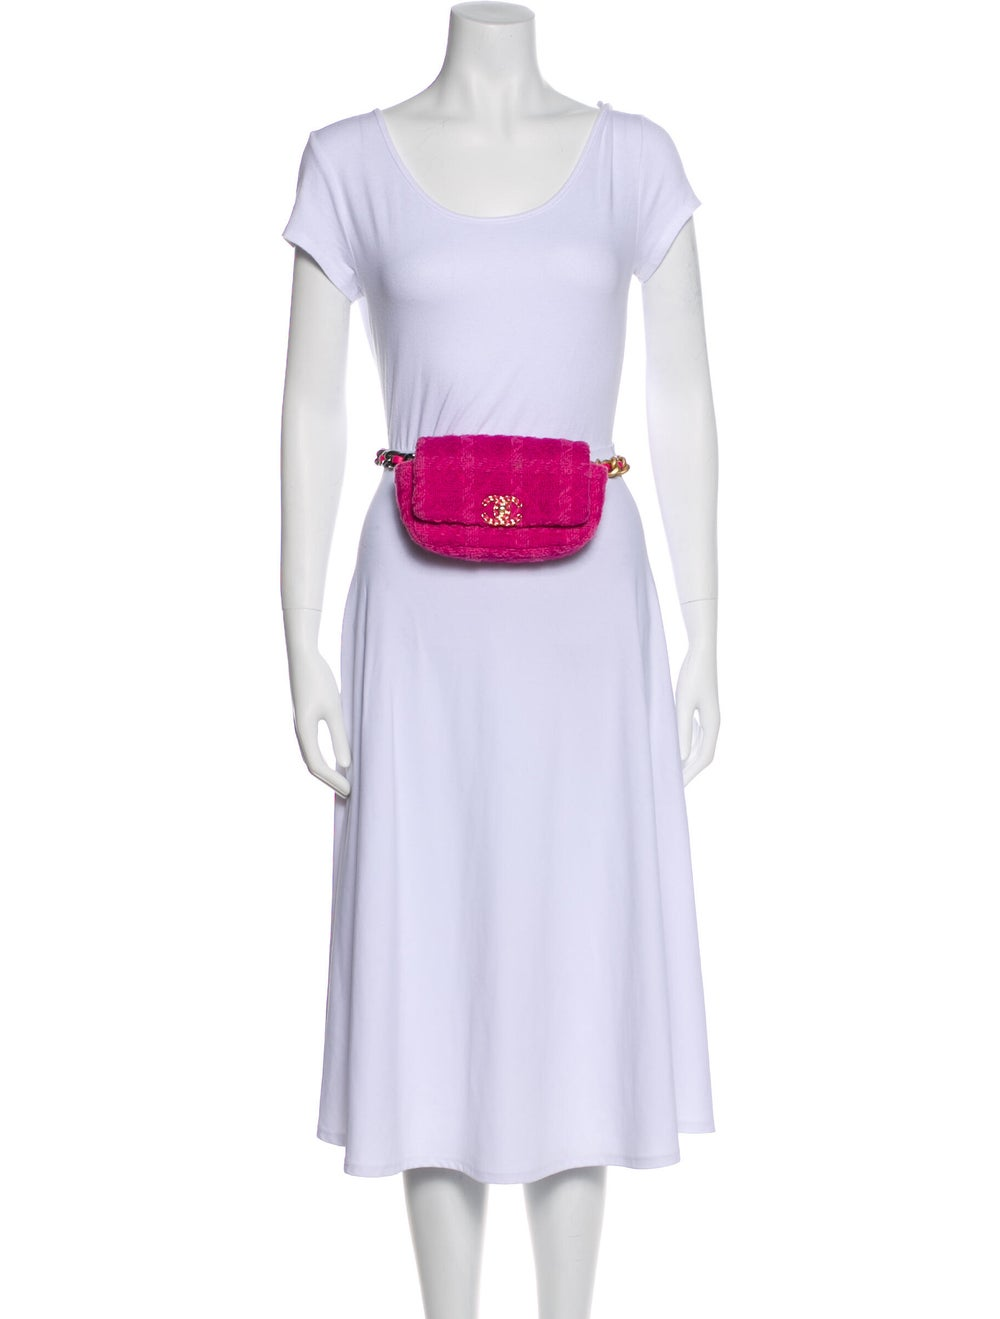 Chanel Tweed 19 Waist Bag Pink - image 3